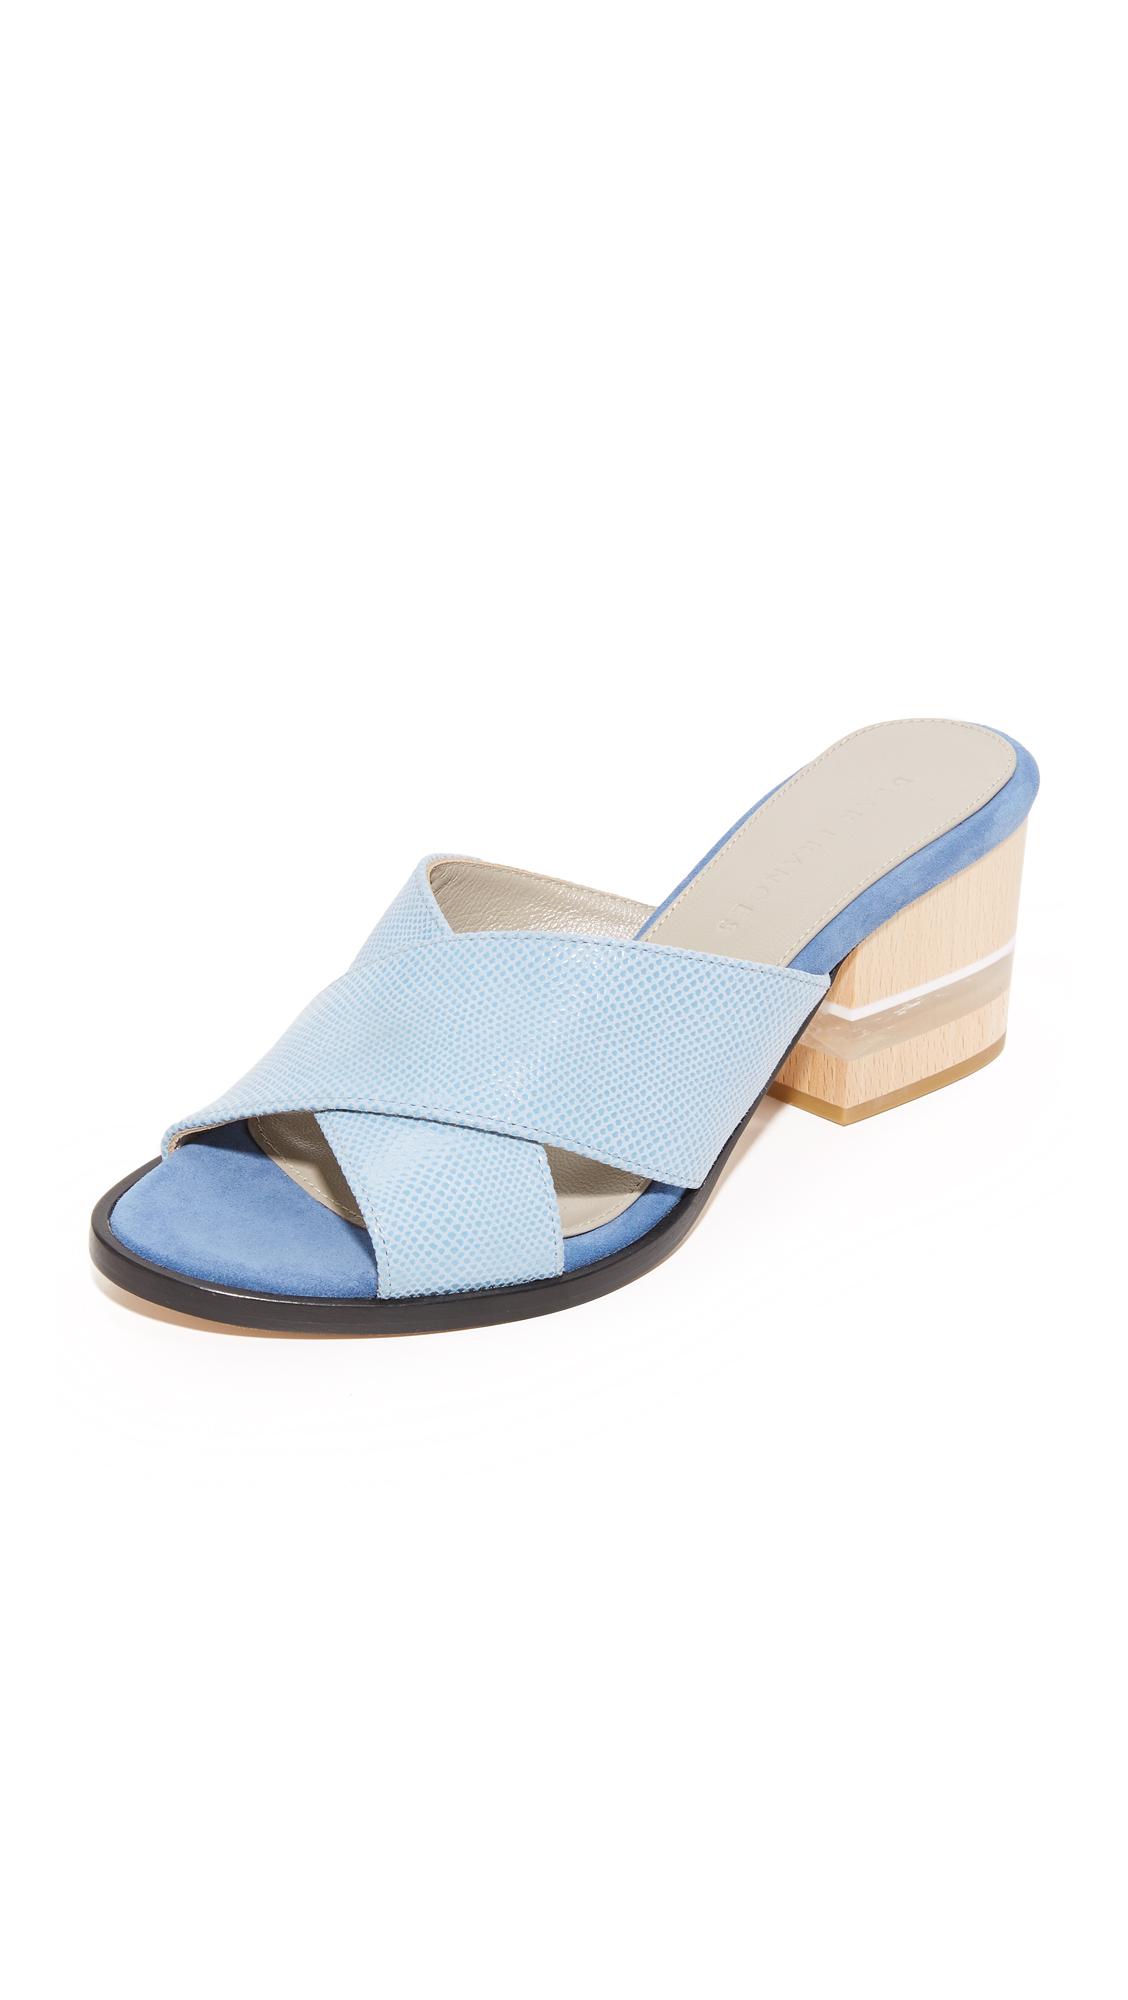 Dear Frances Poser Crisscross Mules - Sea Blue at Shopbop